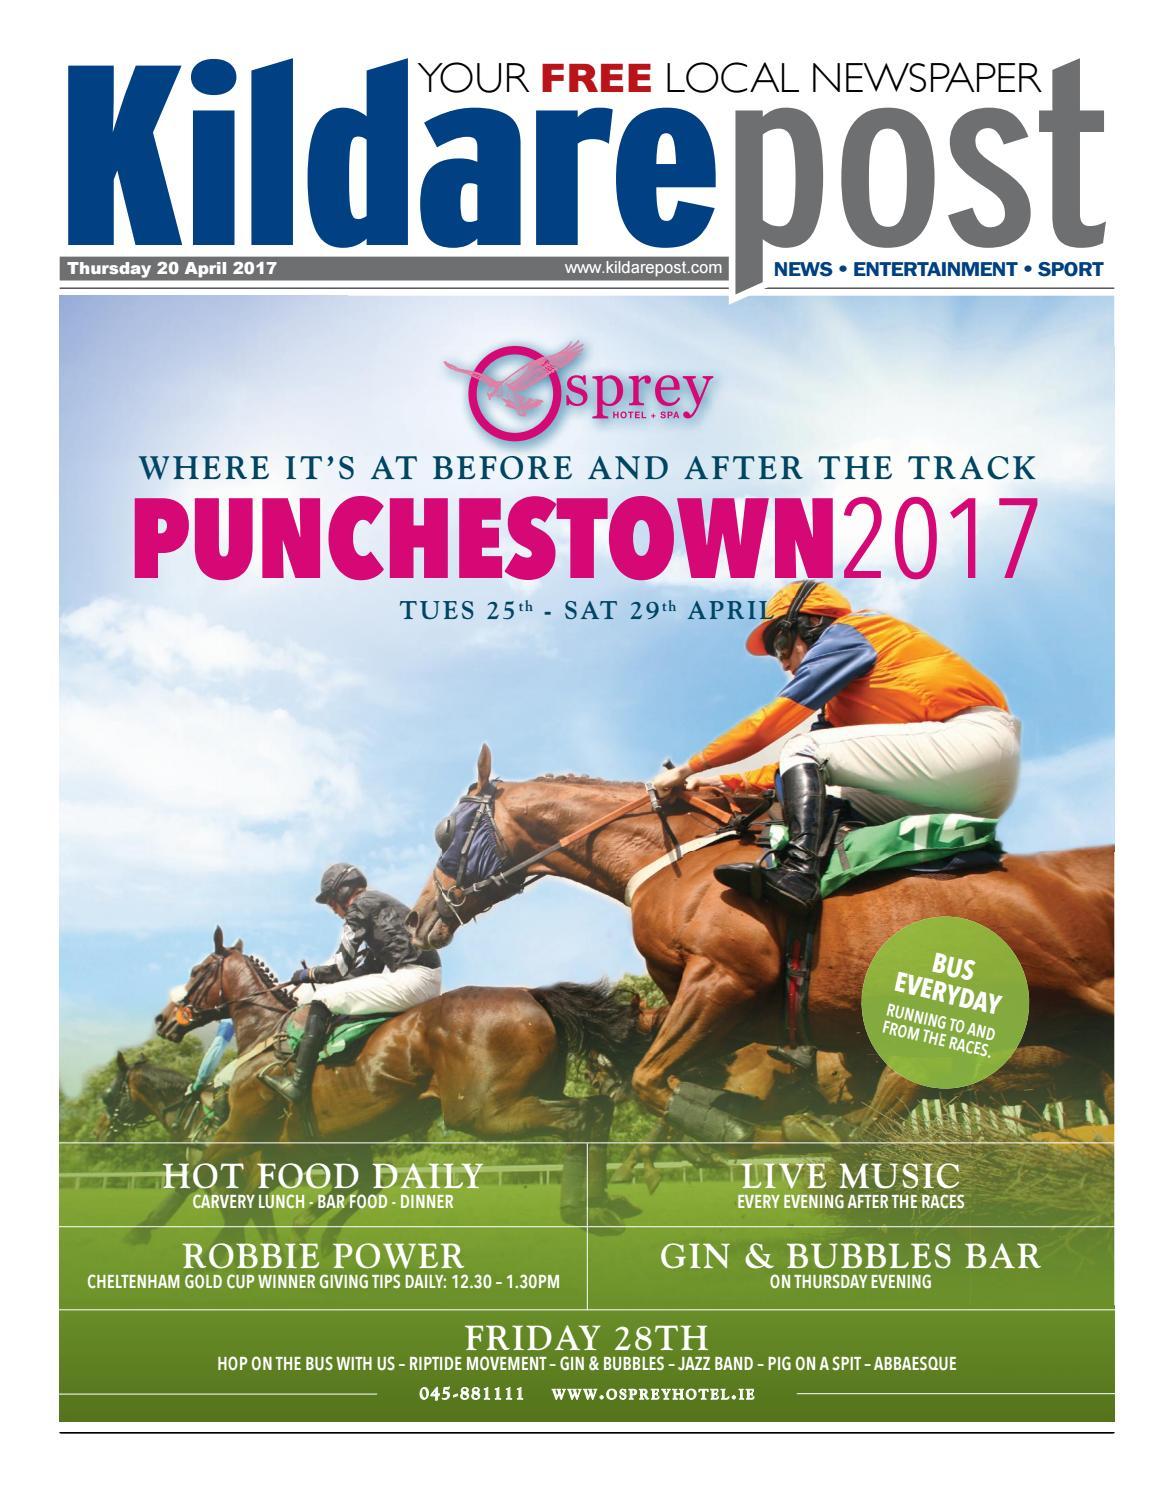 855c9b8db Kildare post 20 04 17 by River Media Newspapers - issuu